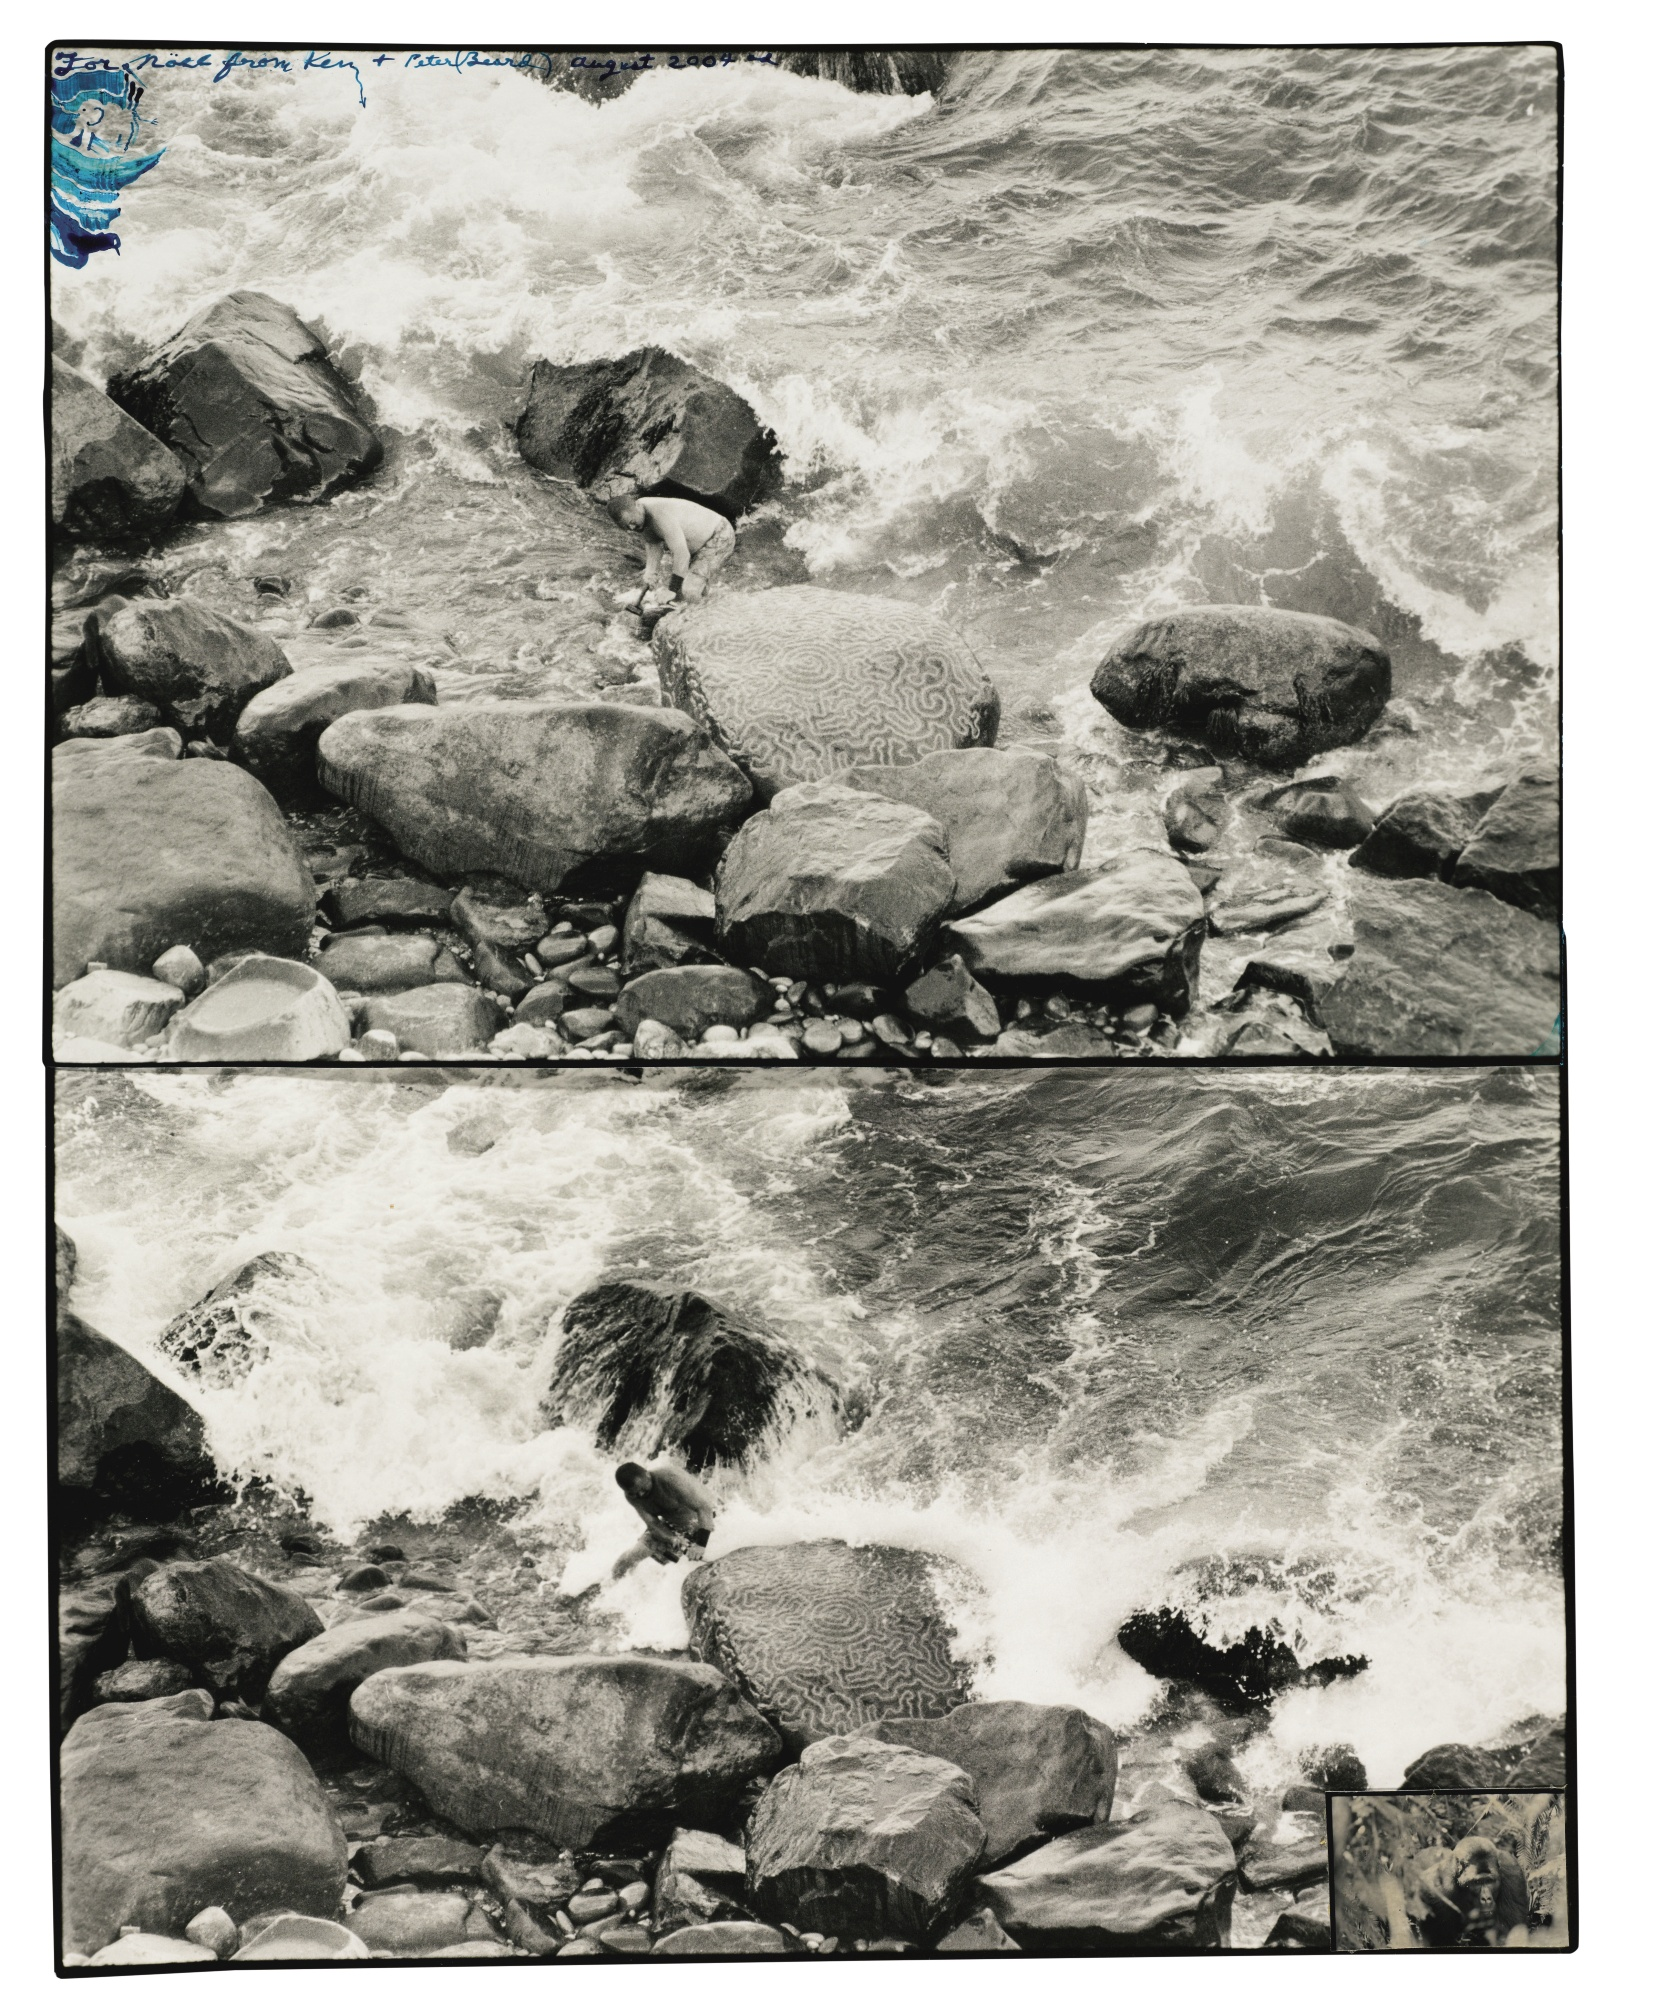 Peter Beard-Ken Hiratsuka Creating Drifted Coral-2004